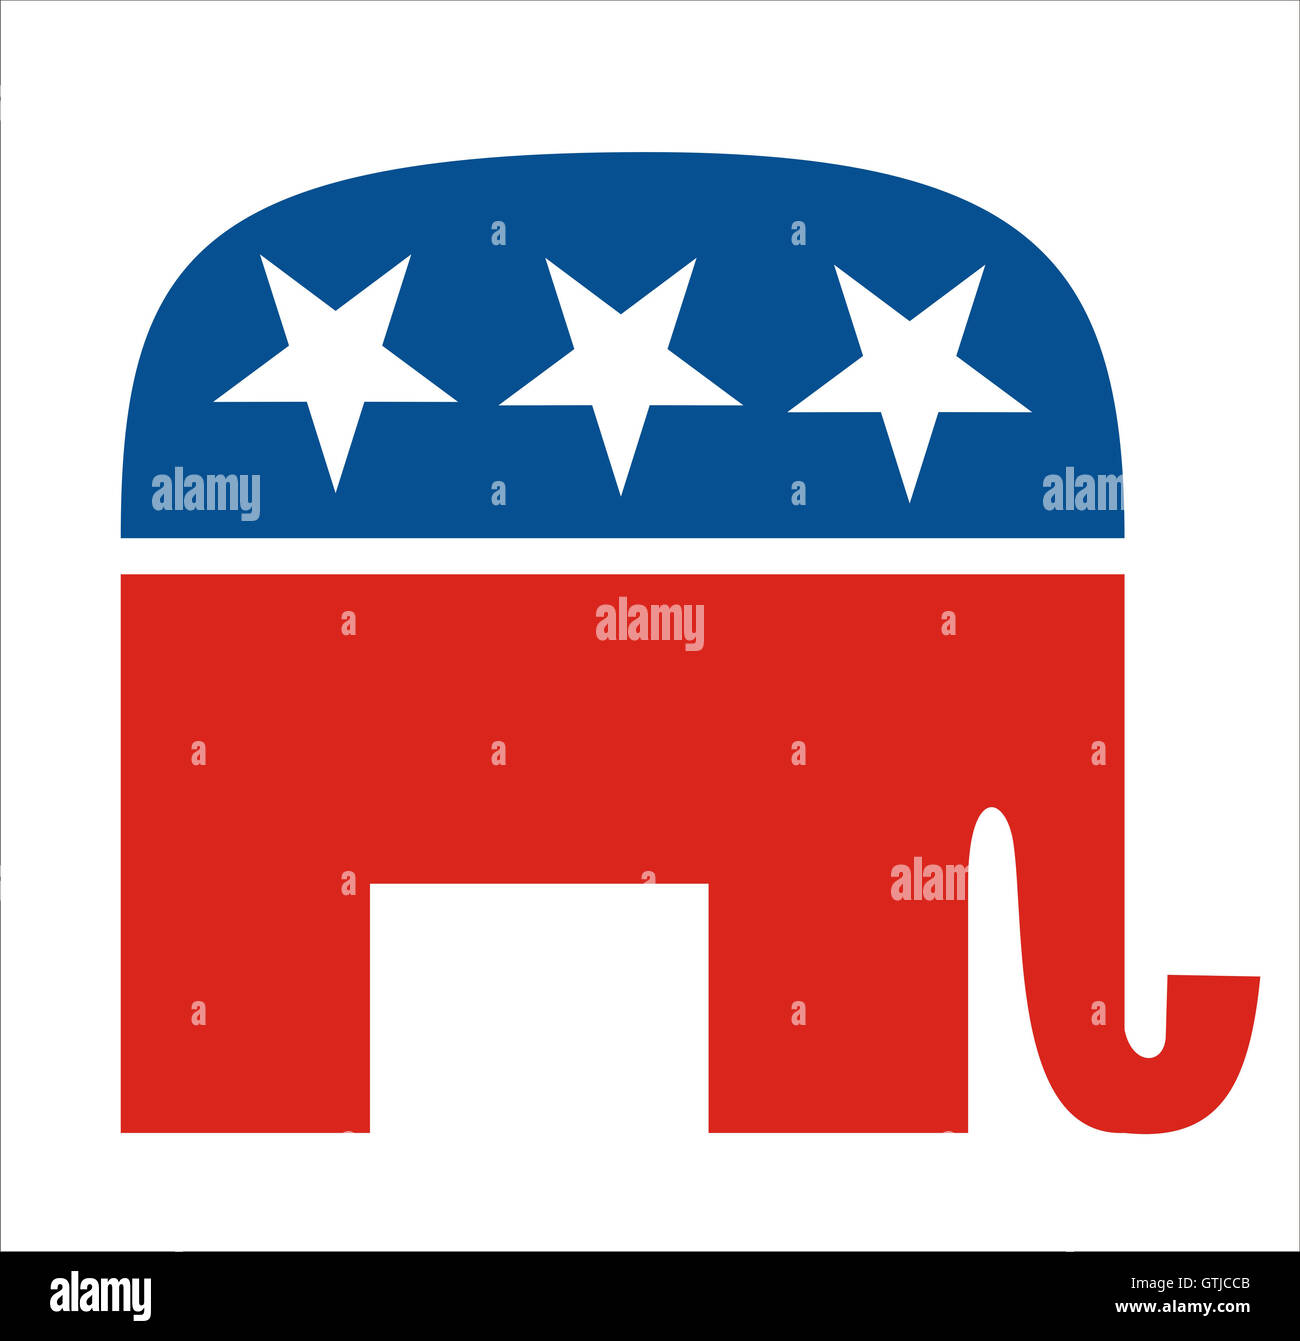 republicans - Stock Image